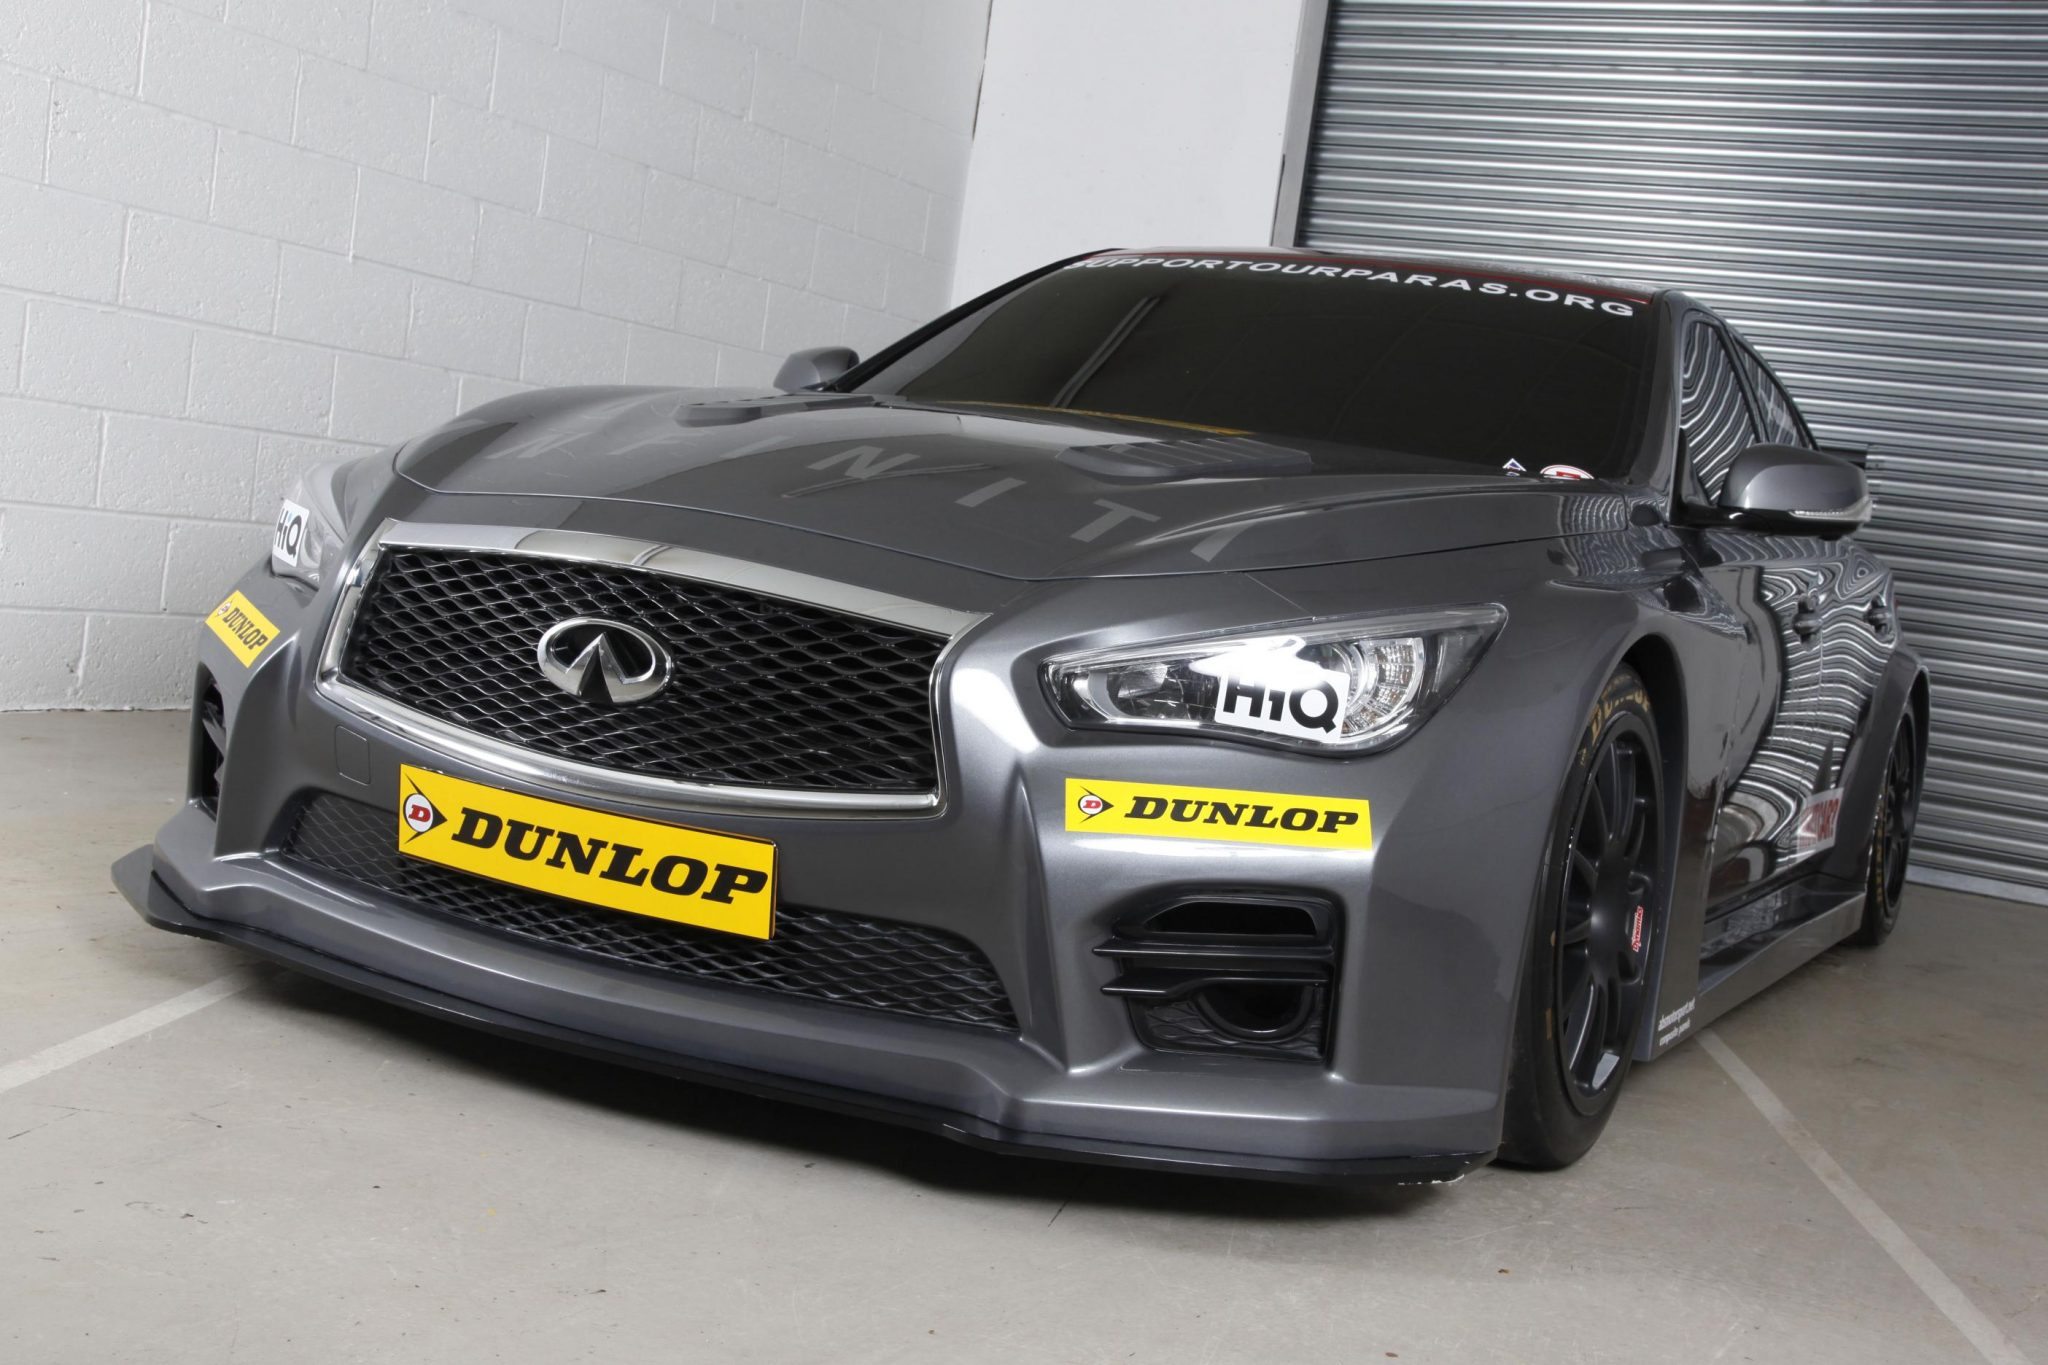 Infiniti Q50 To Race In 2015 British Touring Car Championship Forcegt Com